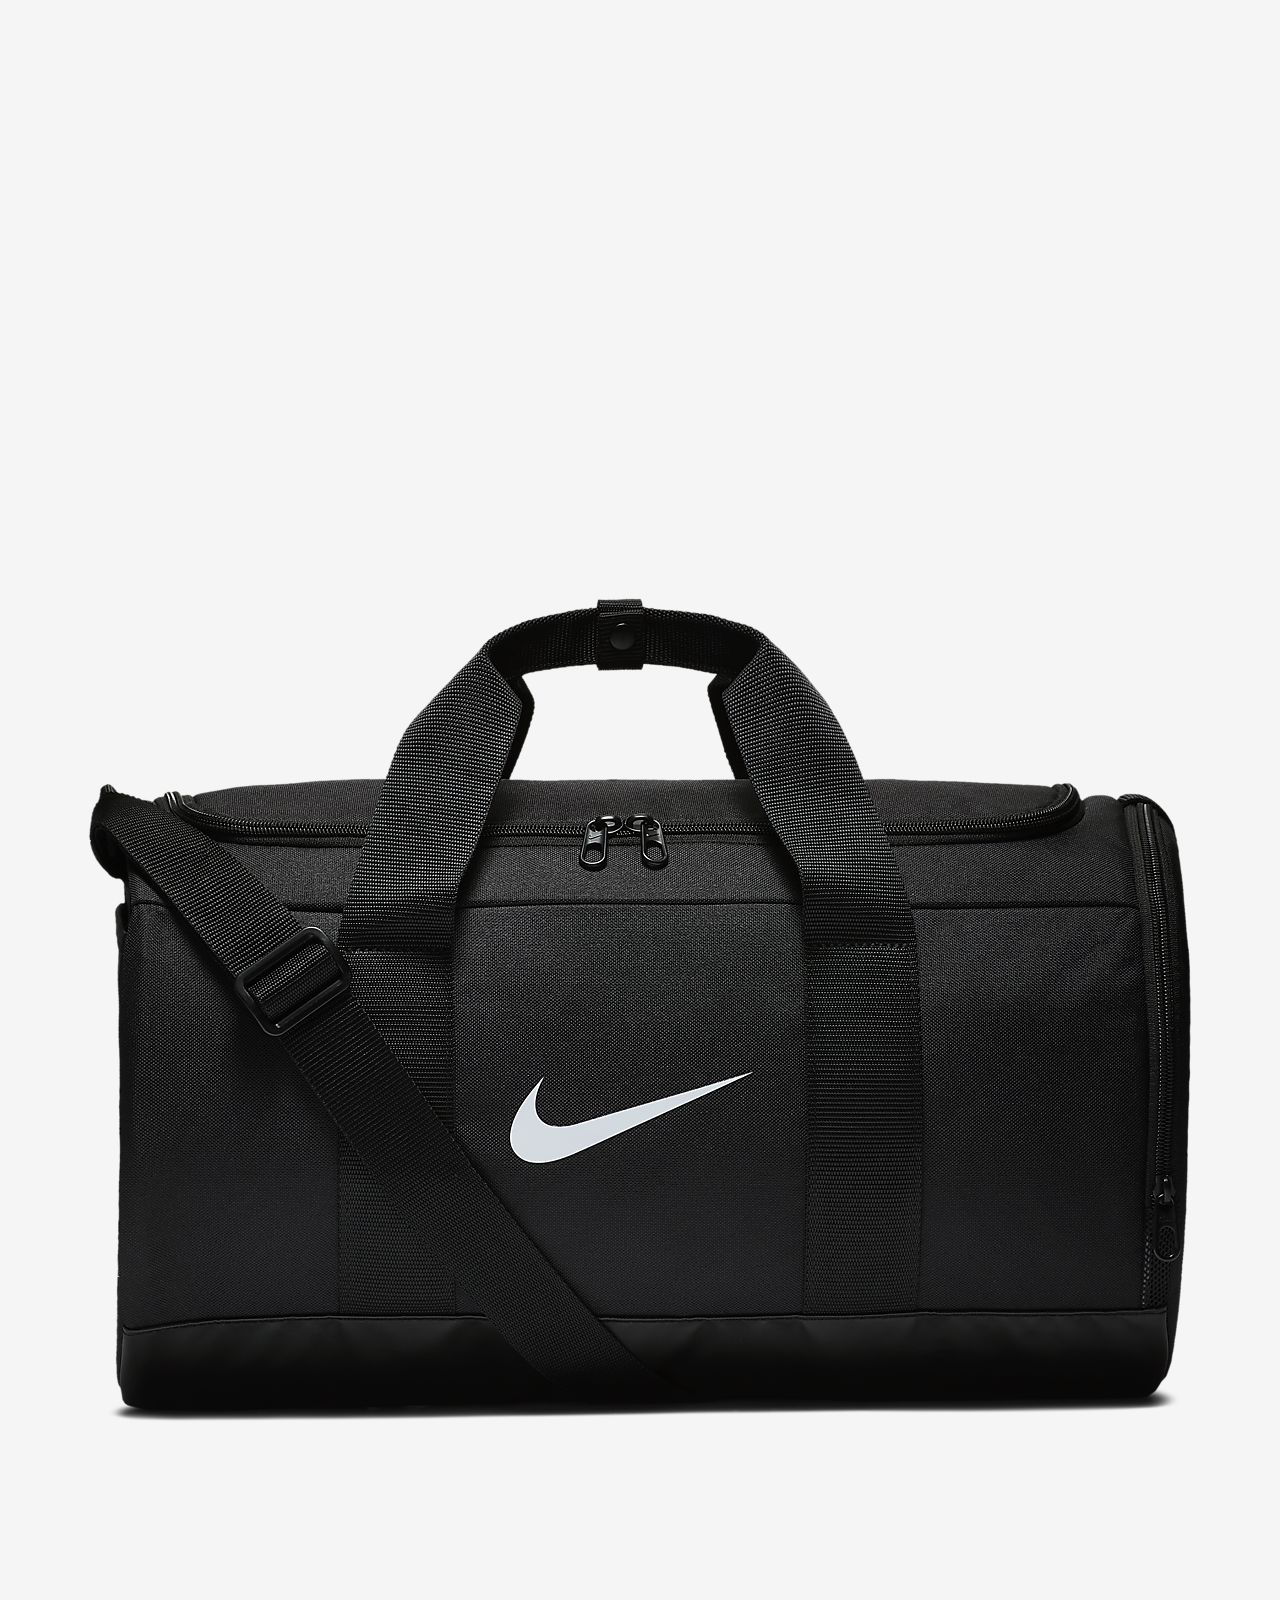 Женская сумка-дафл для тренинга Nike Team